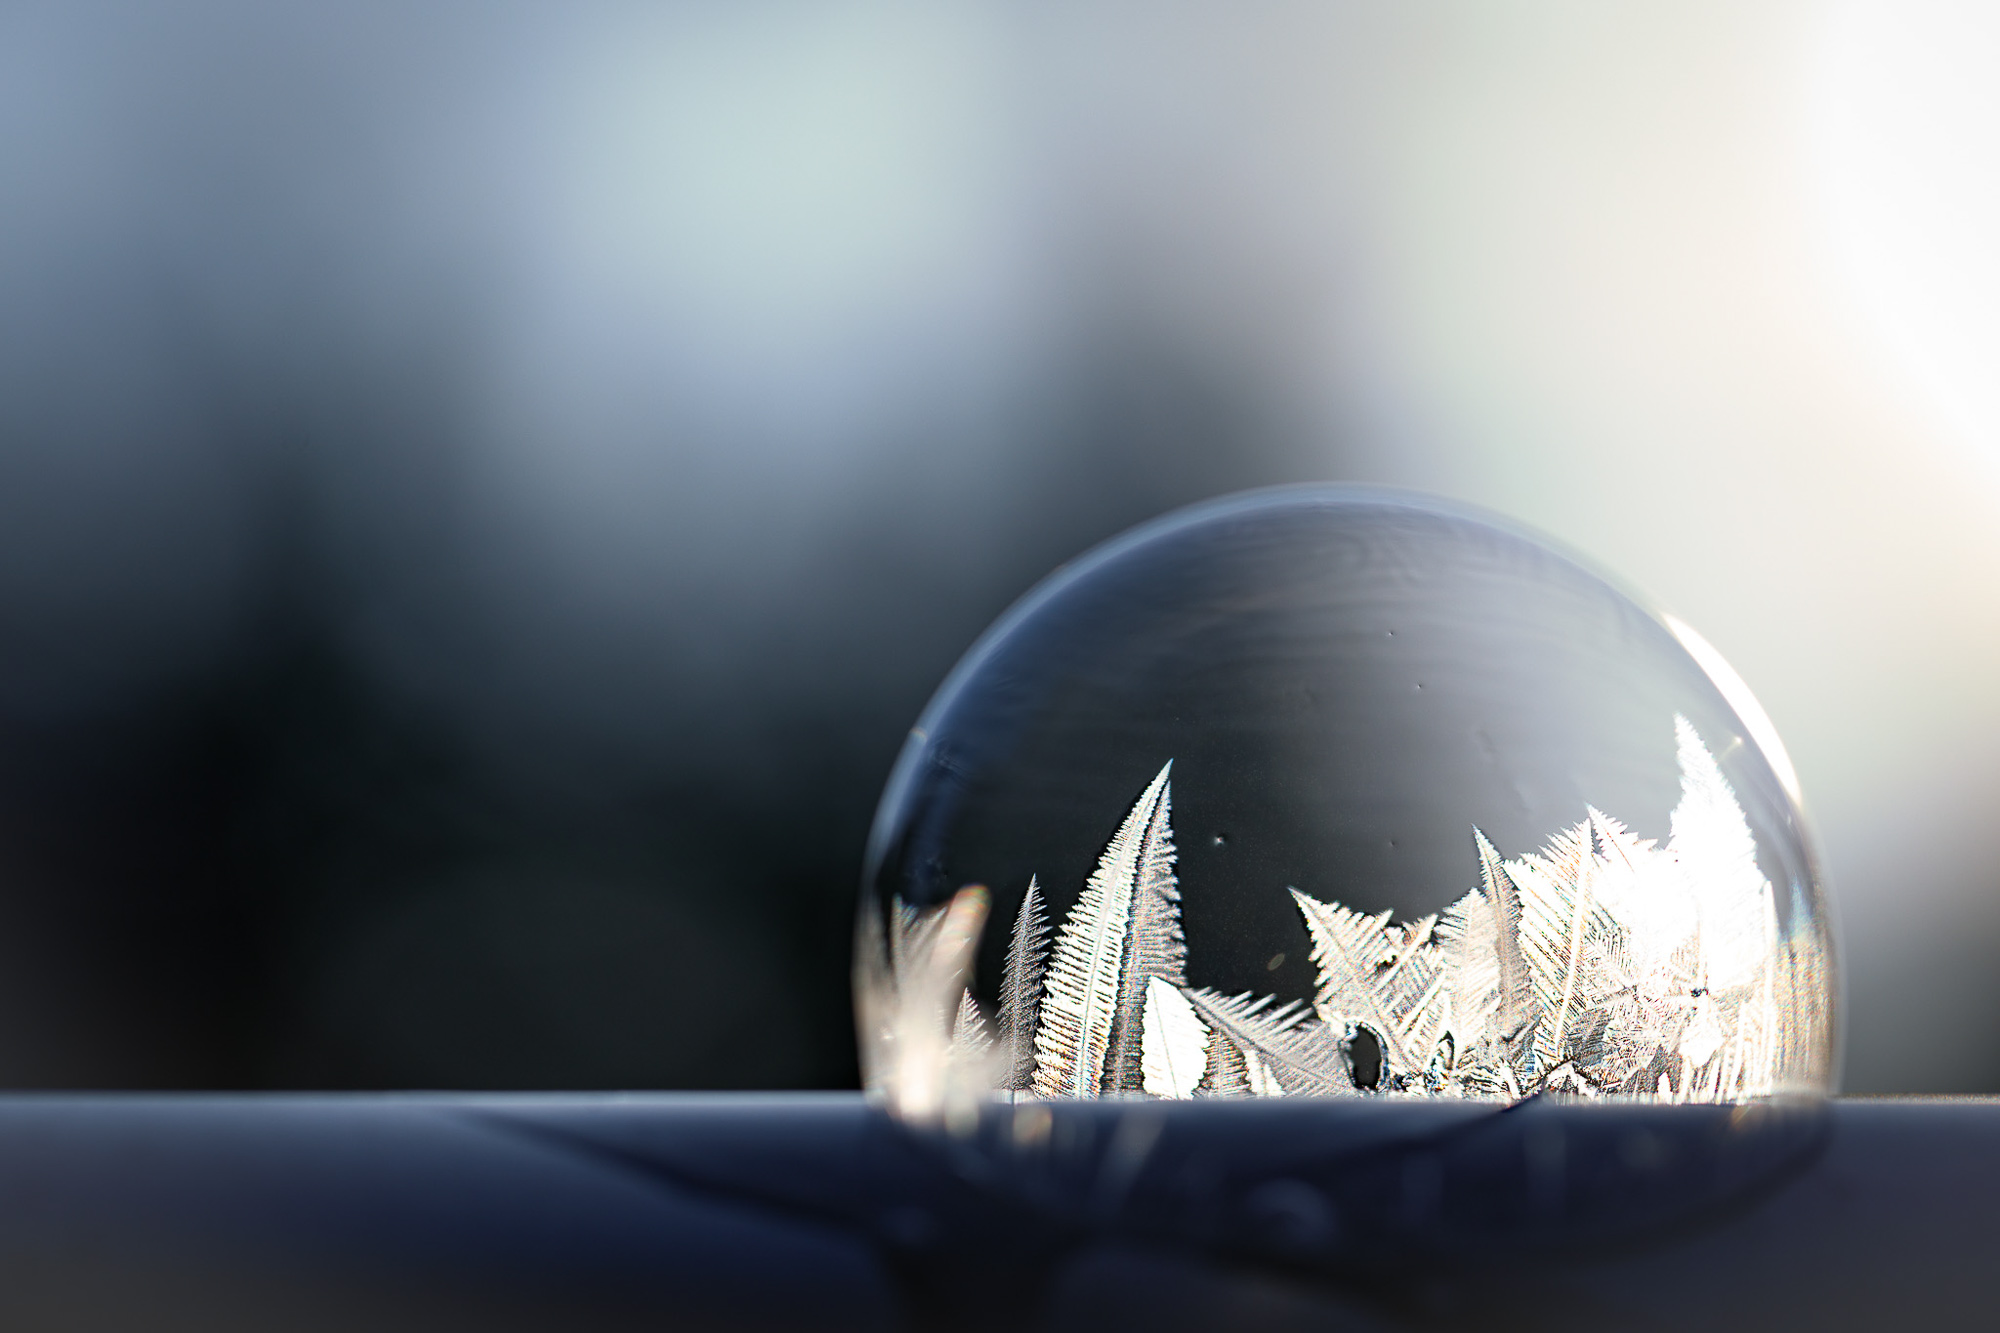 venolab / frosty bubble